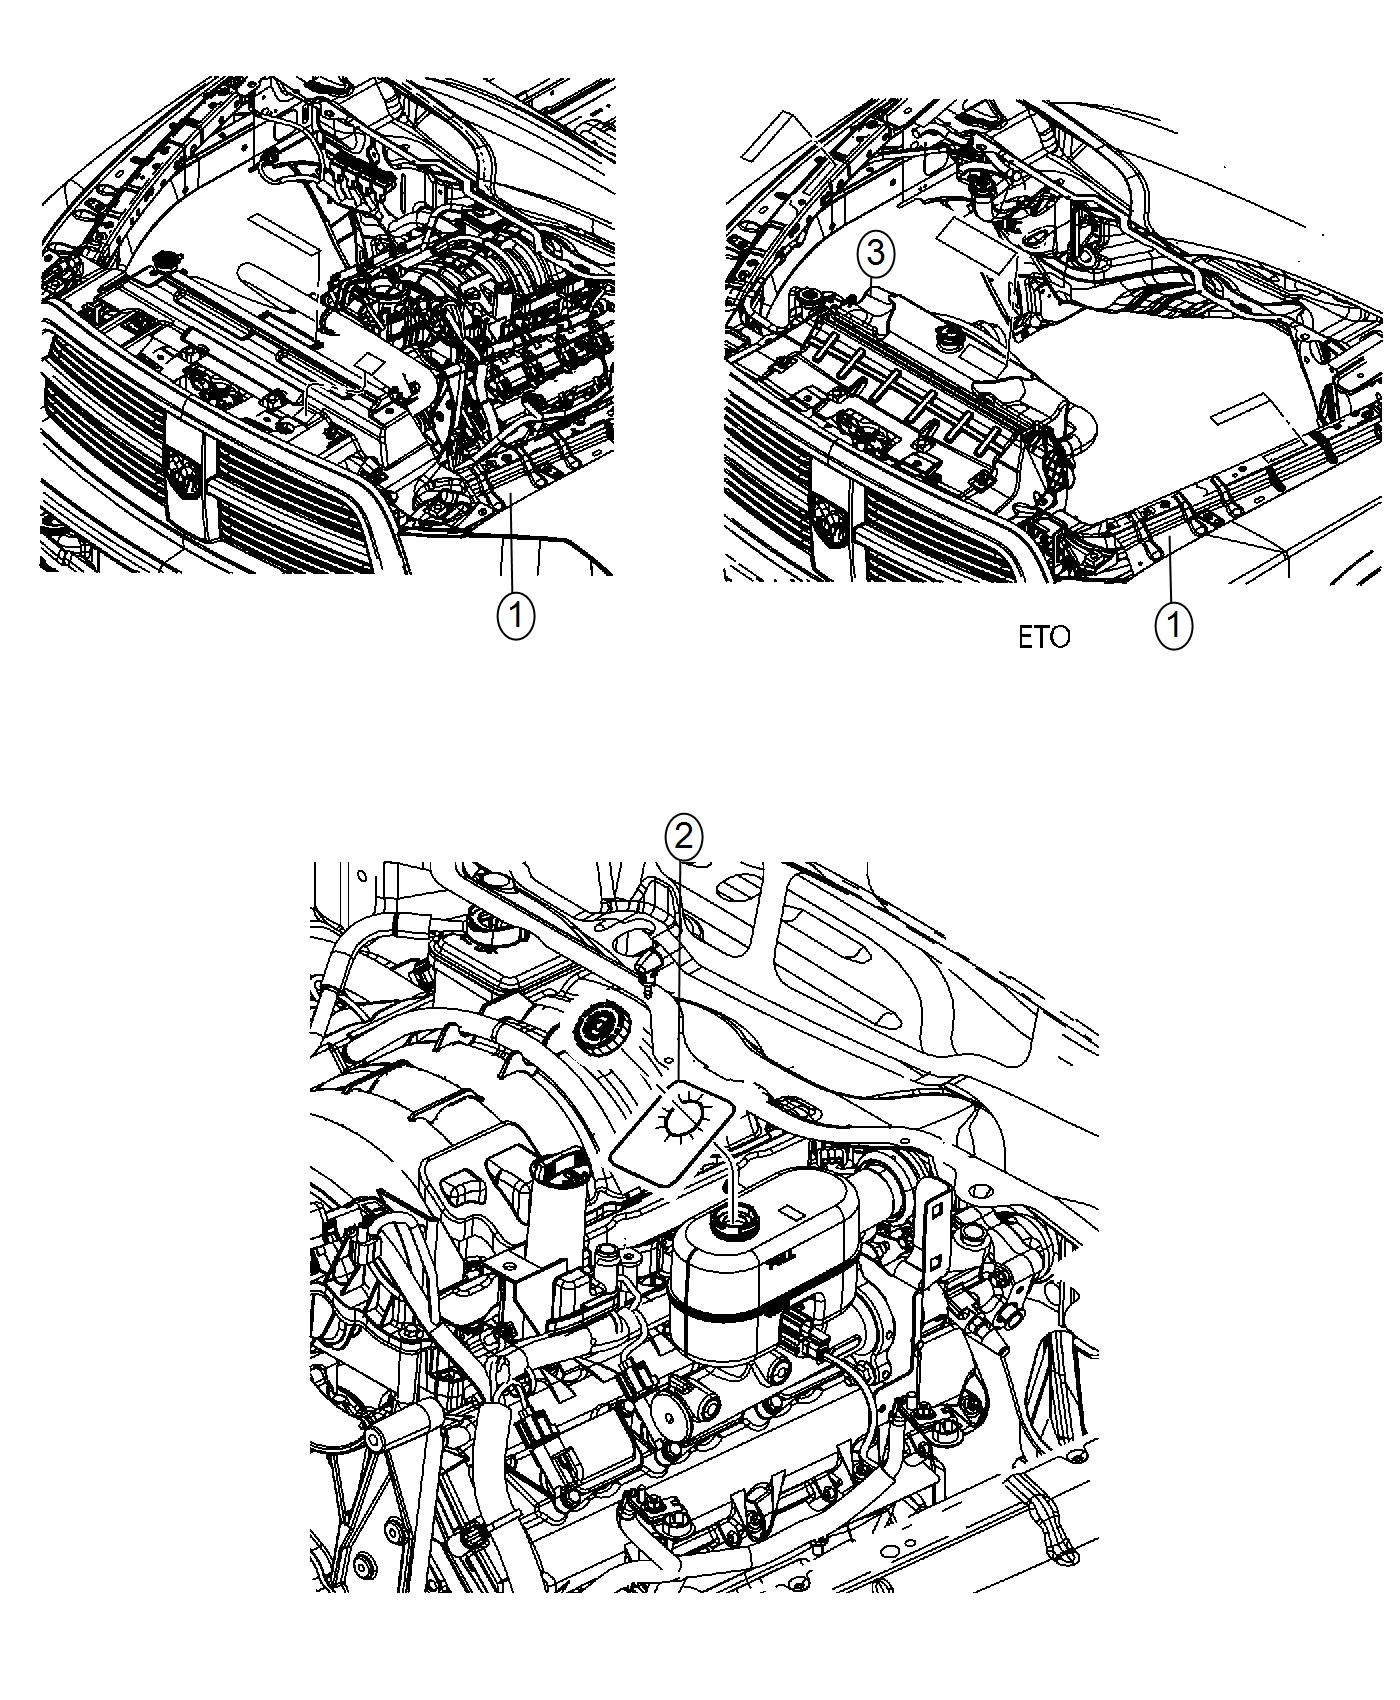 Ram 1500 Decal. Transmission. [stop-start system